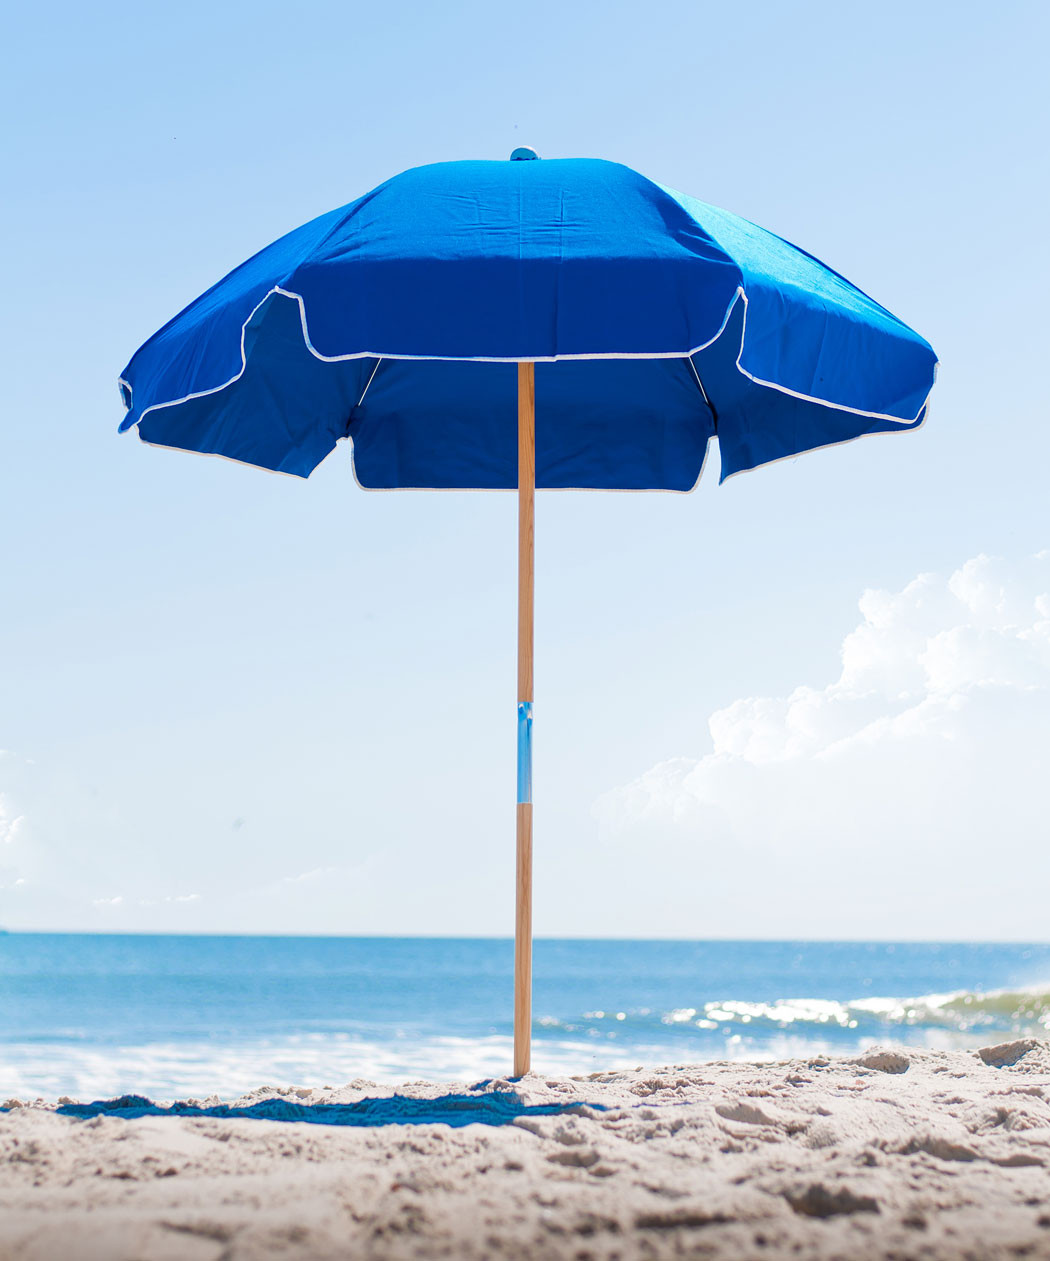 6.5' Diameter Steel Beach Umbrella with 6-Panel Sunbrella® Cover